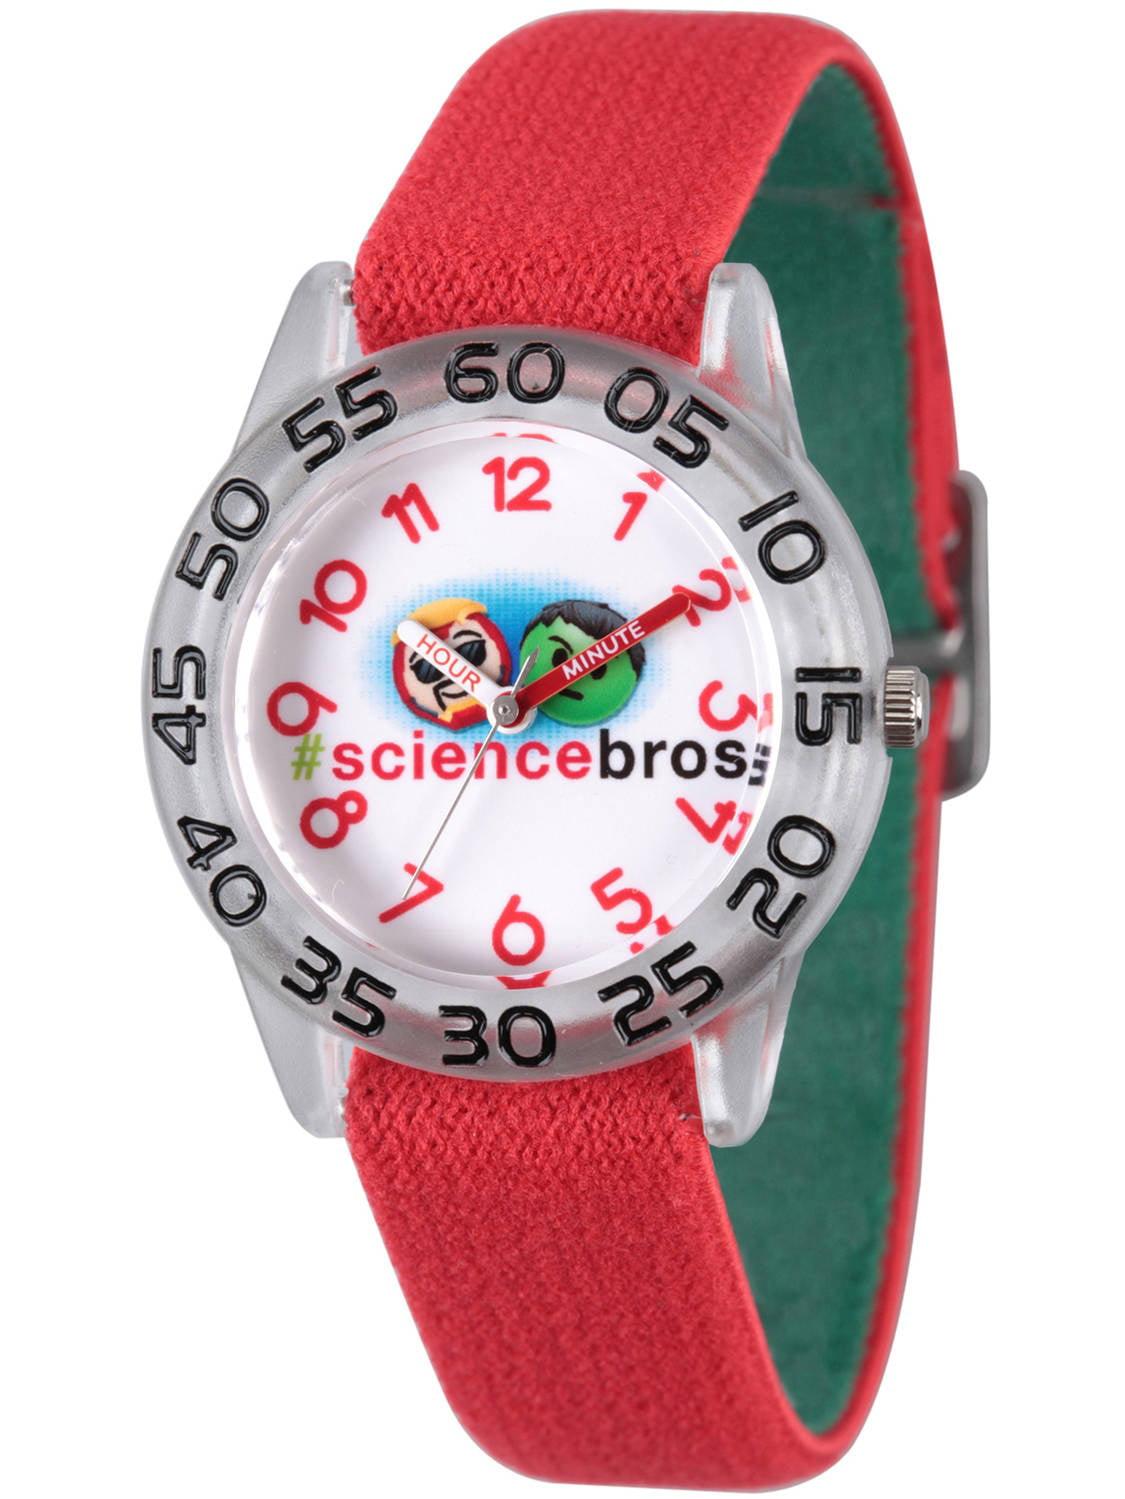 Emoji Kids' Iron Man and Hulk Clear Plastic Time Teacher Watch, Reversible Red and Green Elastic Nylon Strap